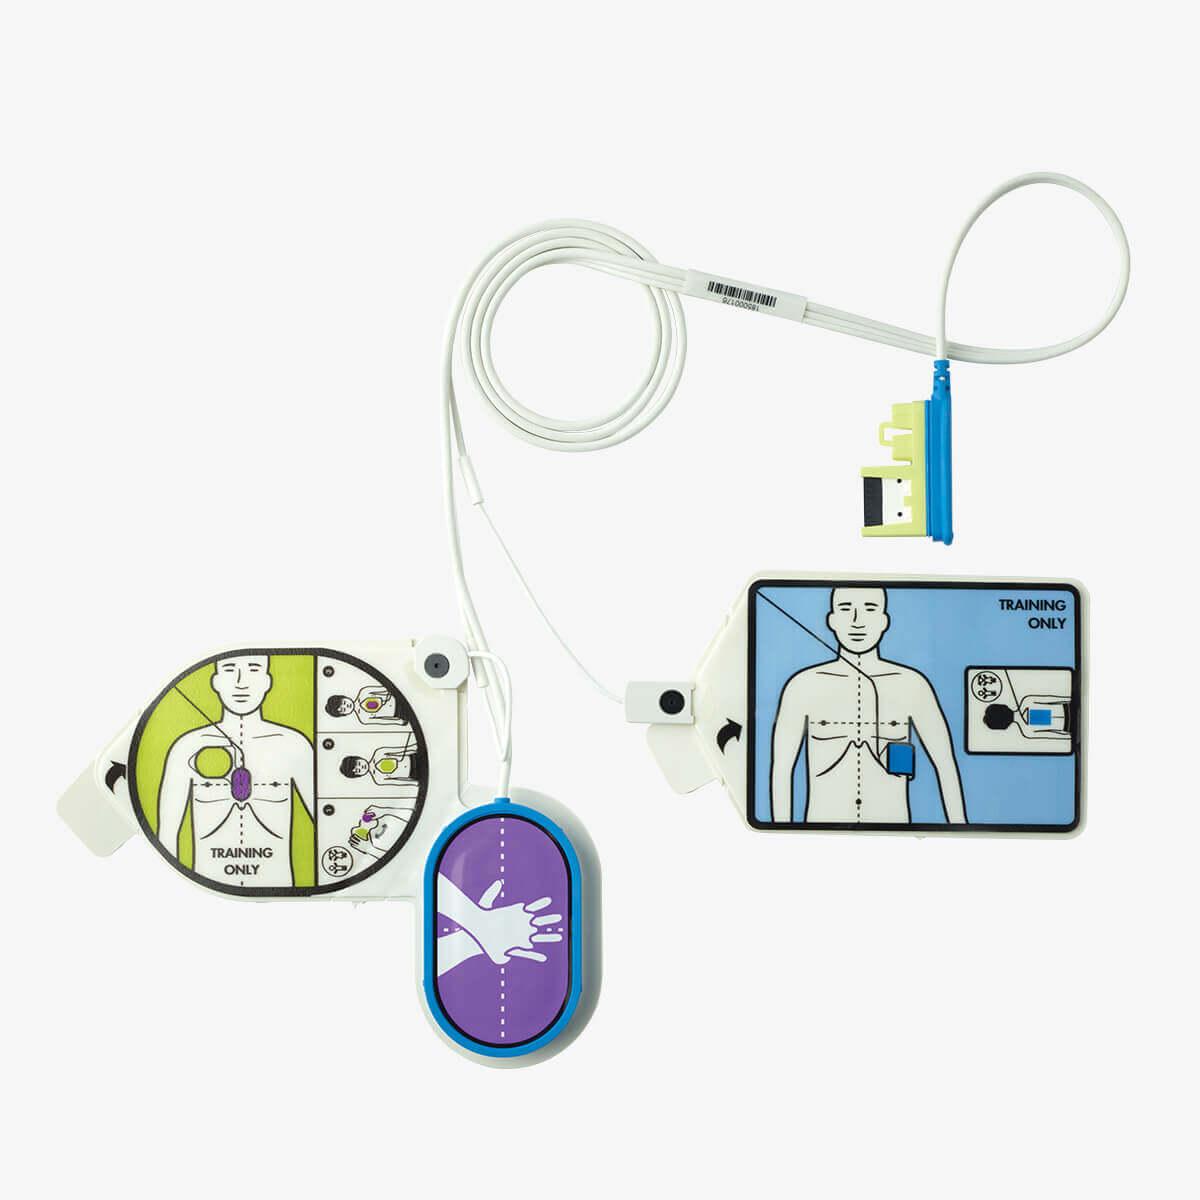 Trainingselektrode ZOLL CPR Uni-padz II für den ZOLL AED 3 Trainer